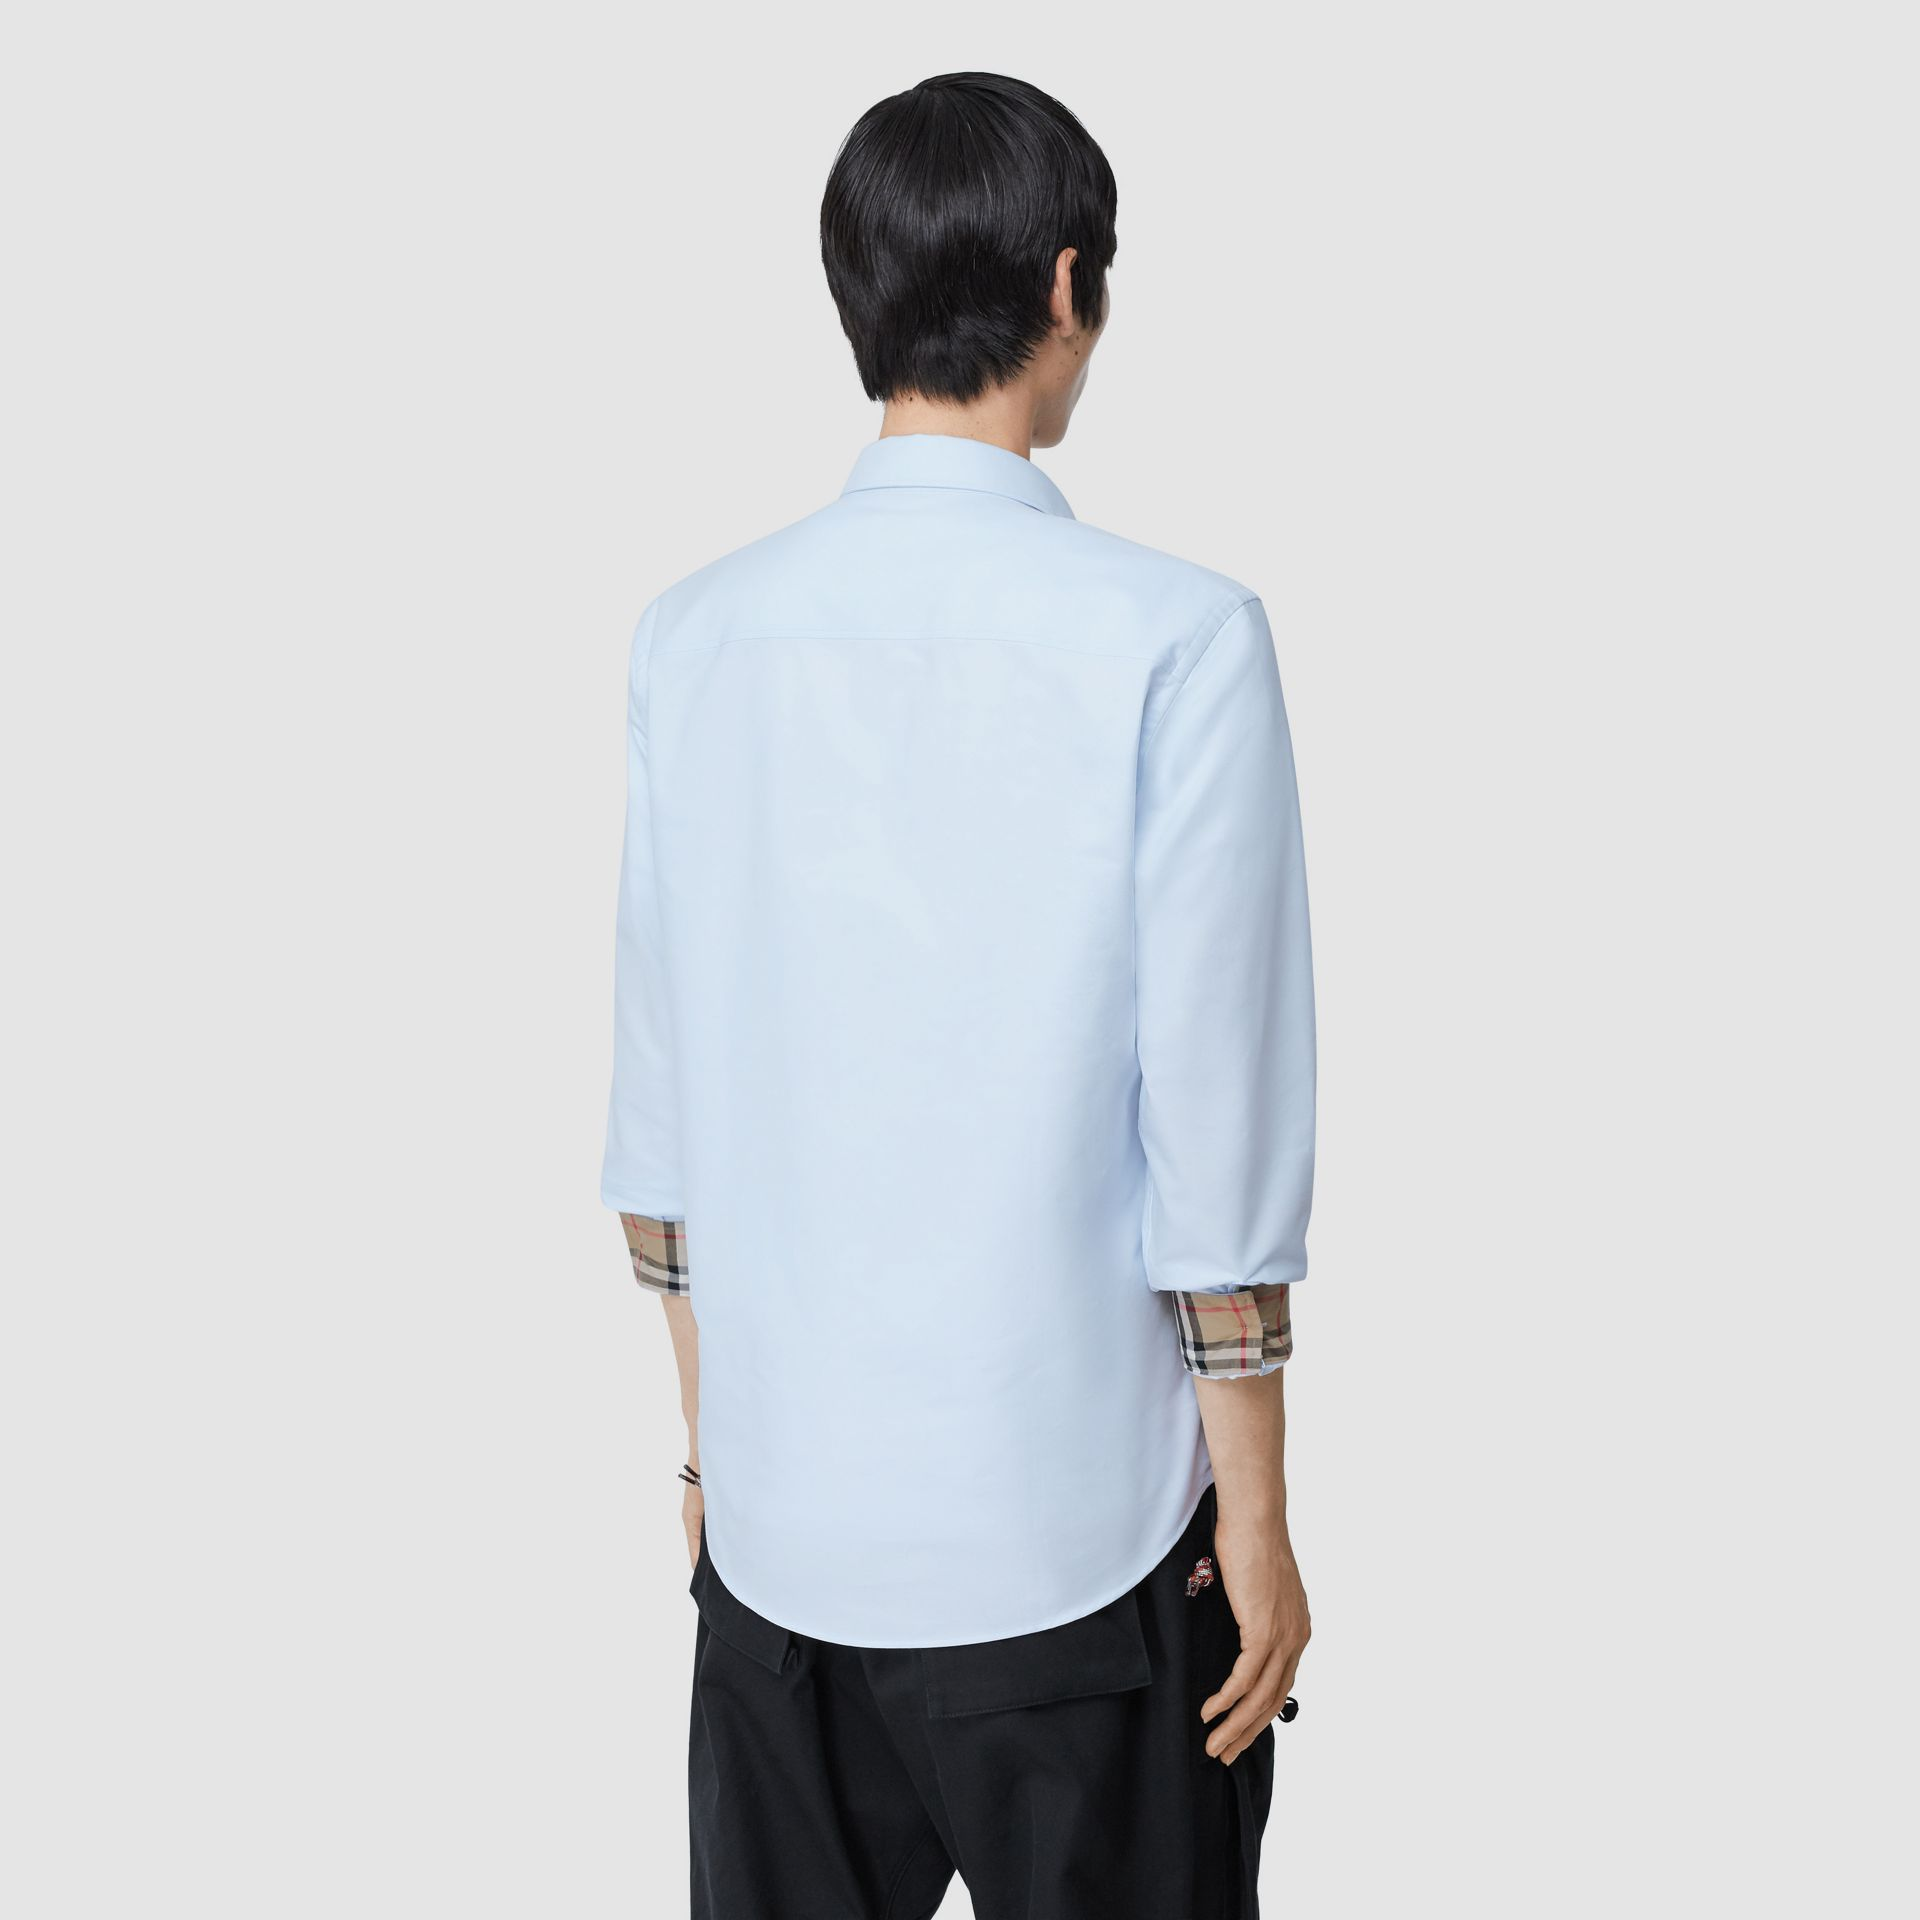 Monogram Motif Cotton Oxford Shirt in White - Men | Burberry - gallery image 2